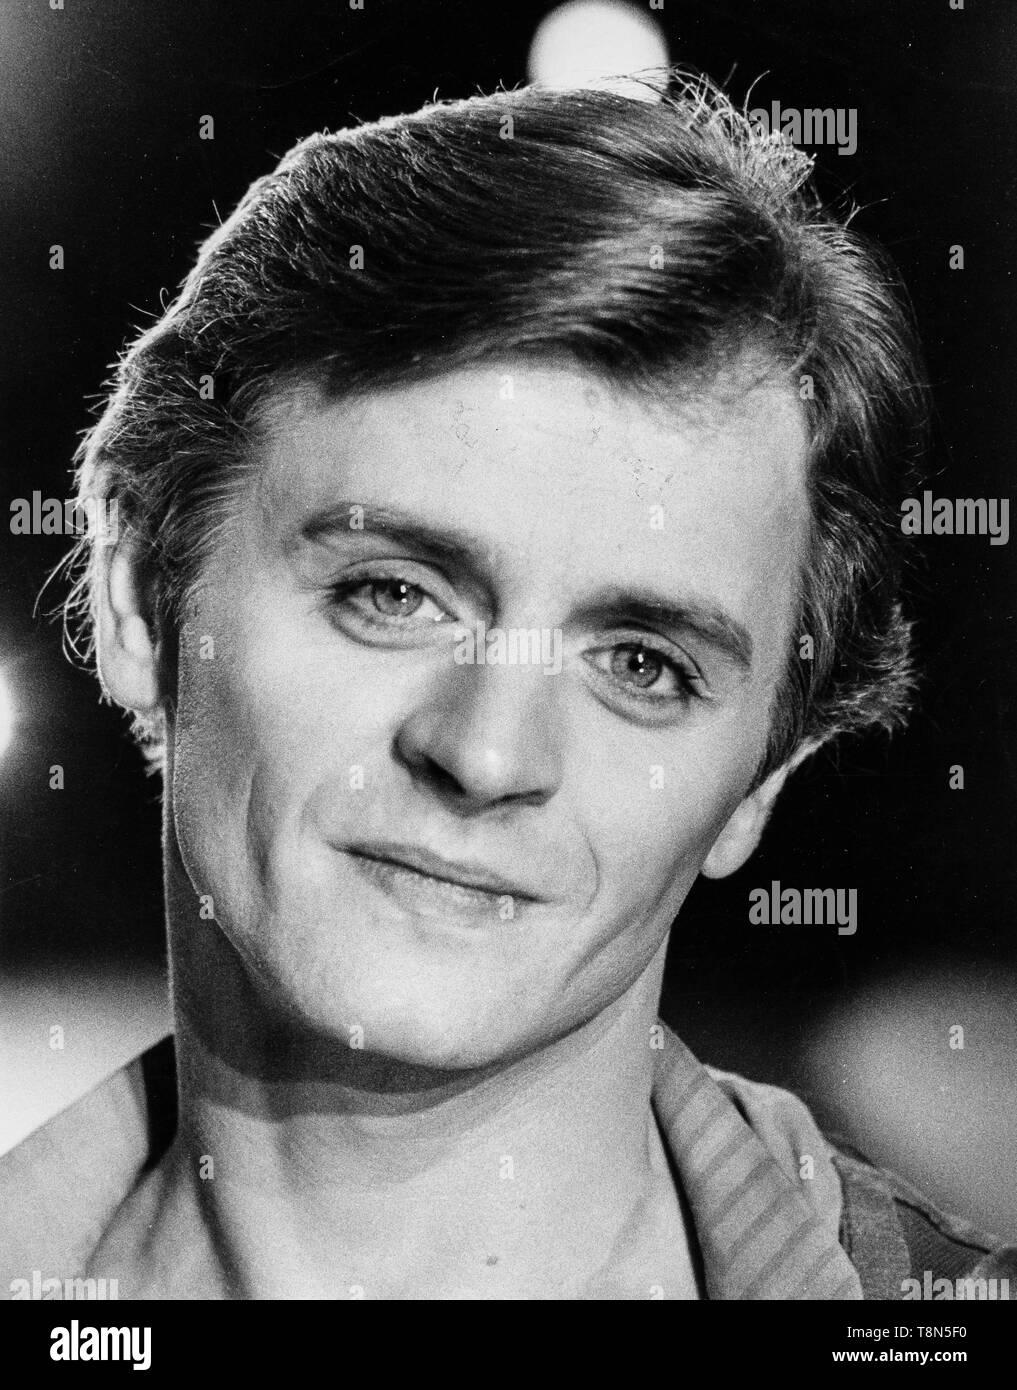 mikhail baryshnikov, 1980 - Stock Image